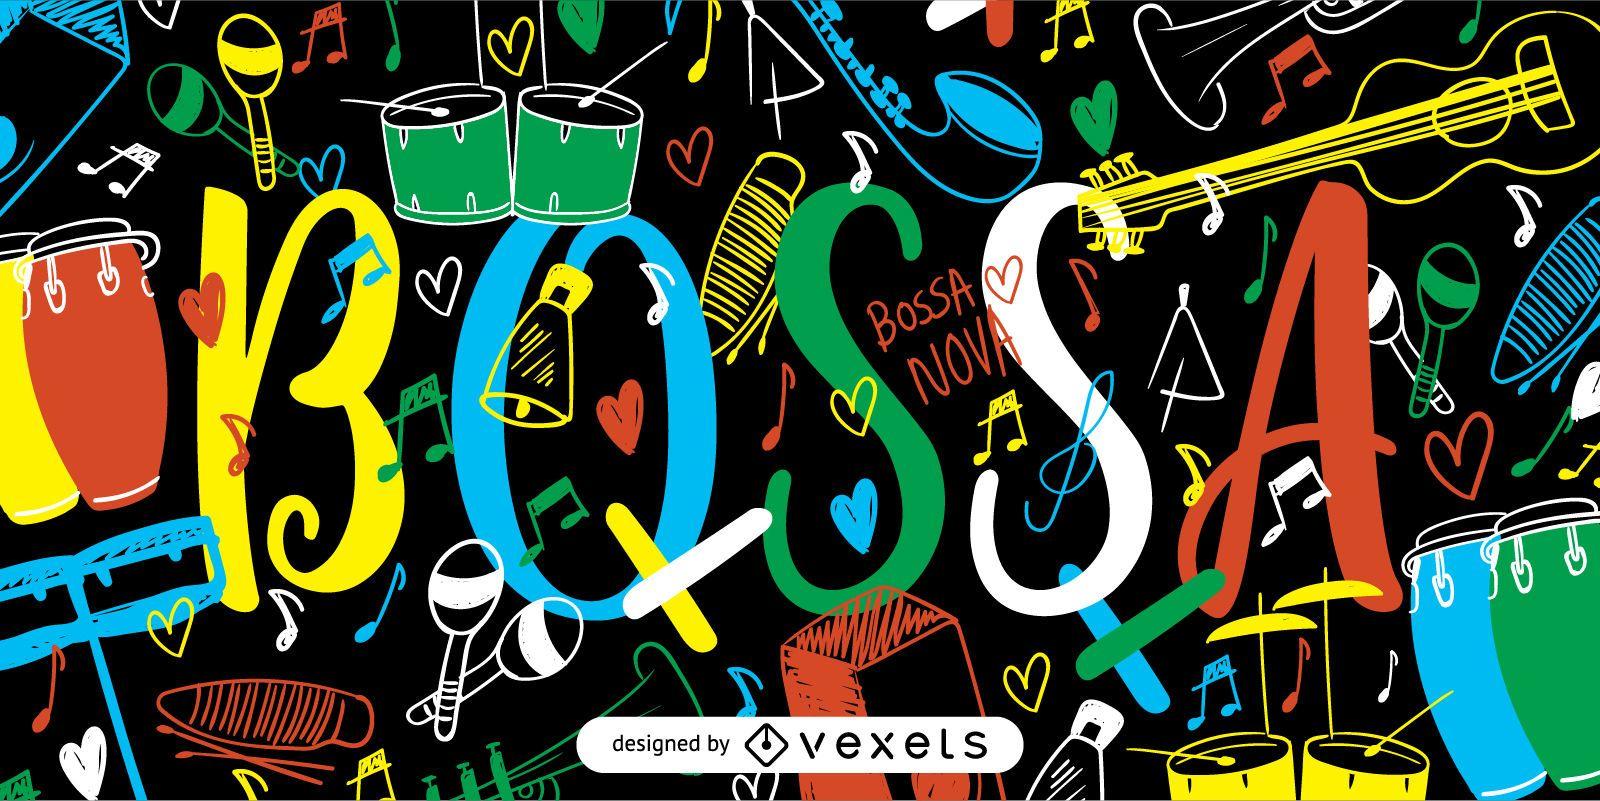 Coloful Bossa Nova poster illustration